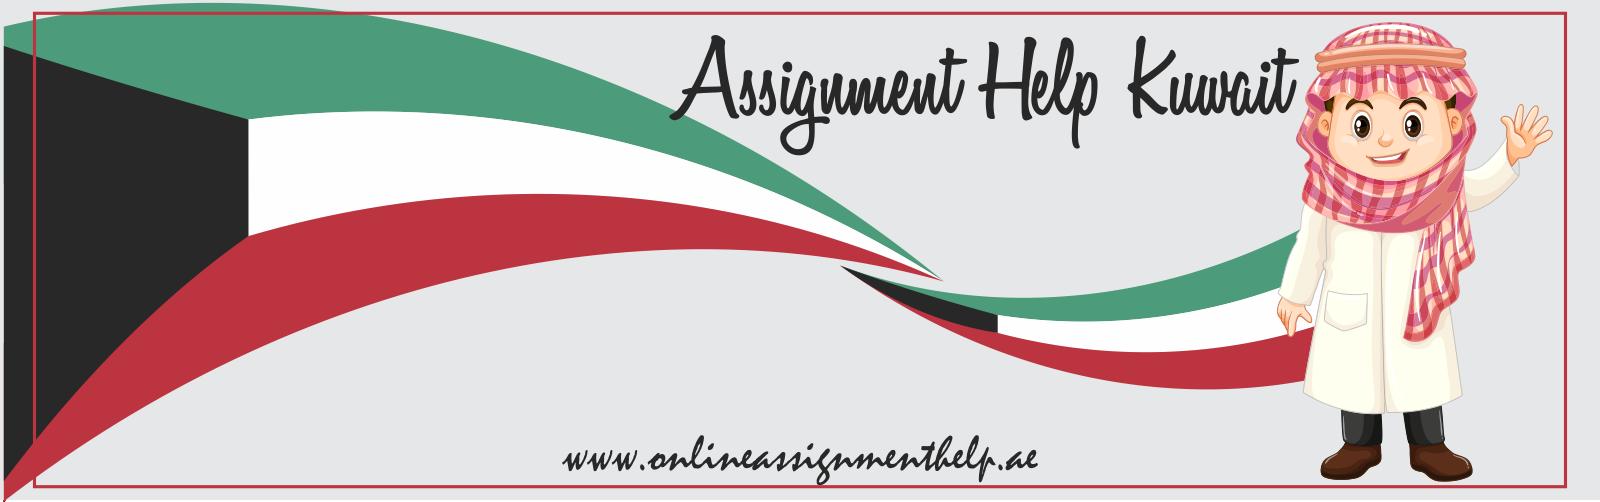 Assignment Help Kuwait